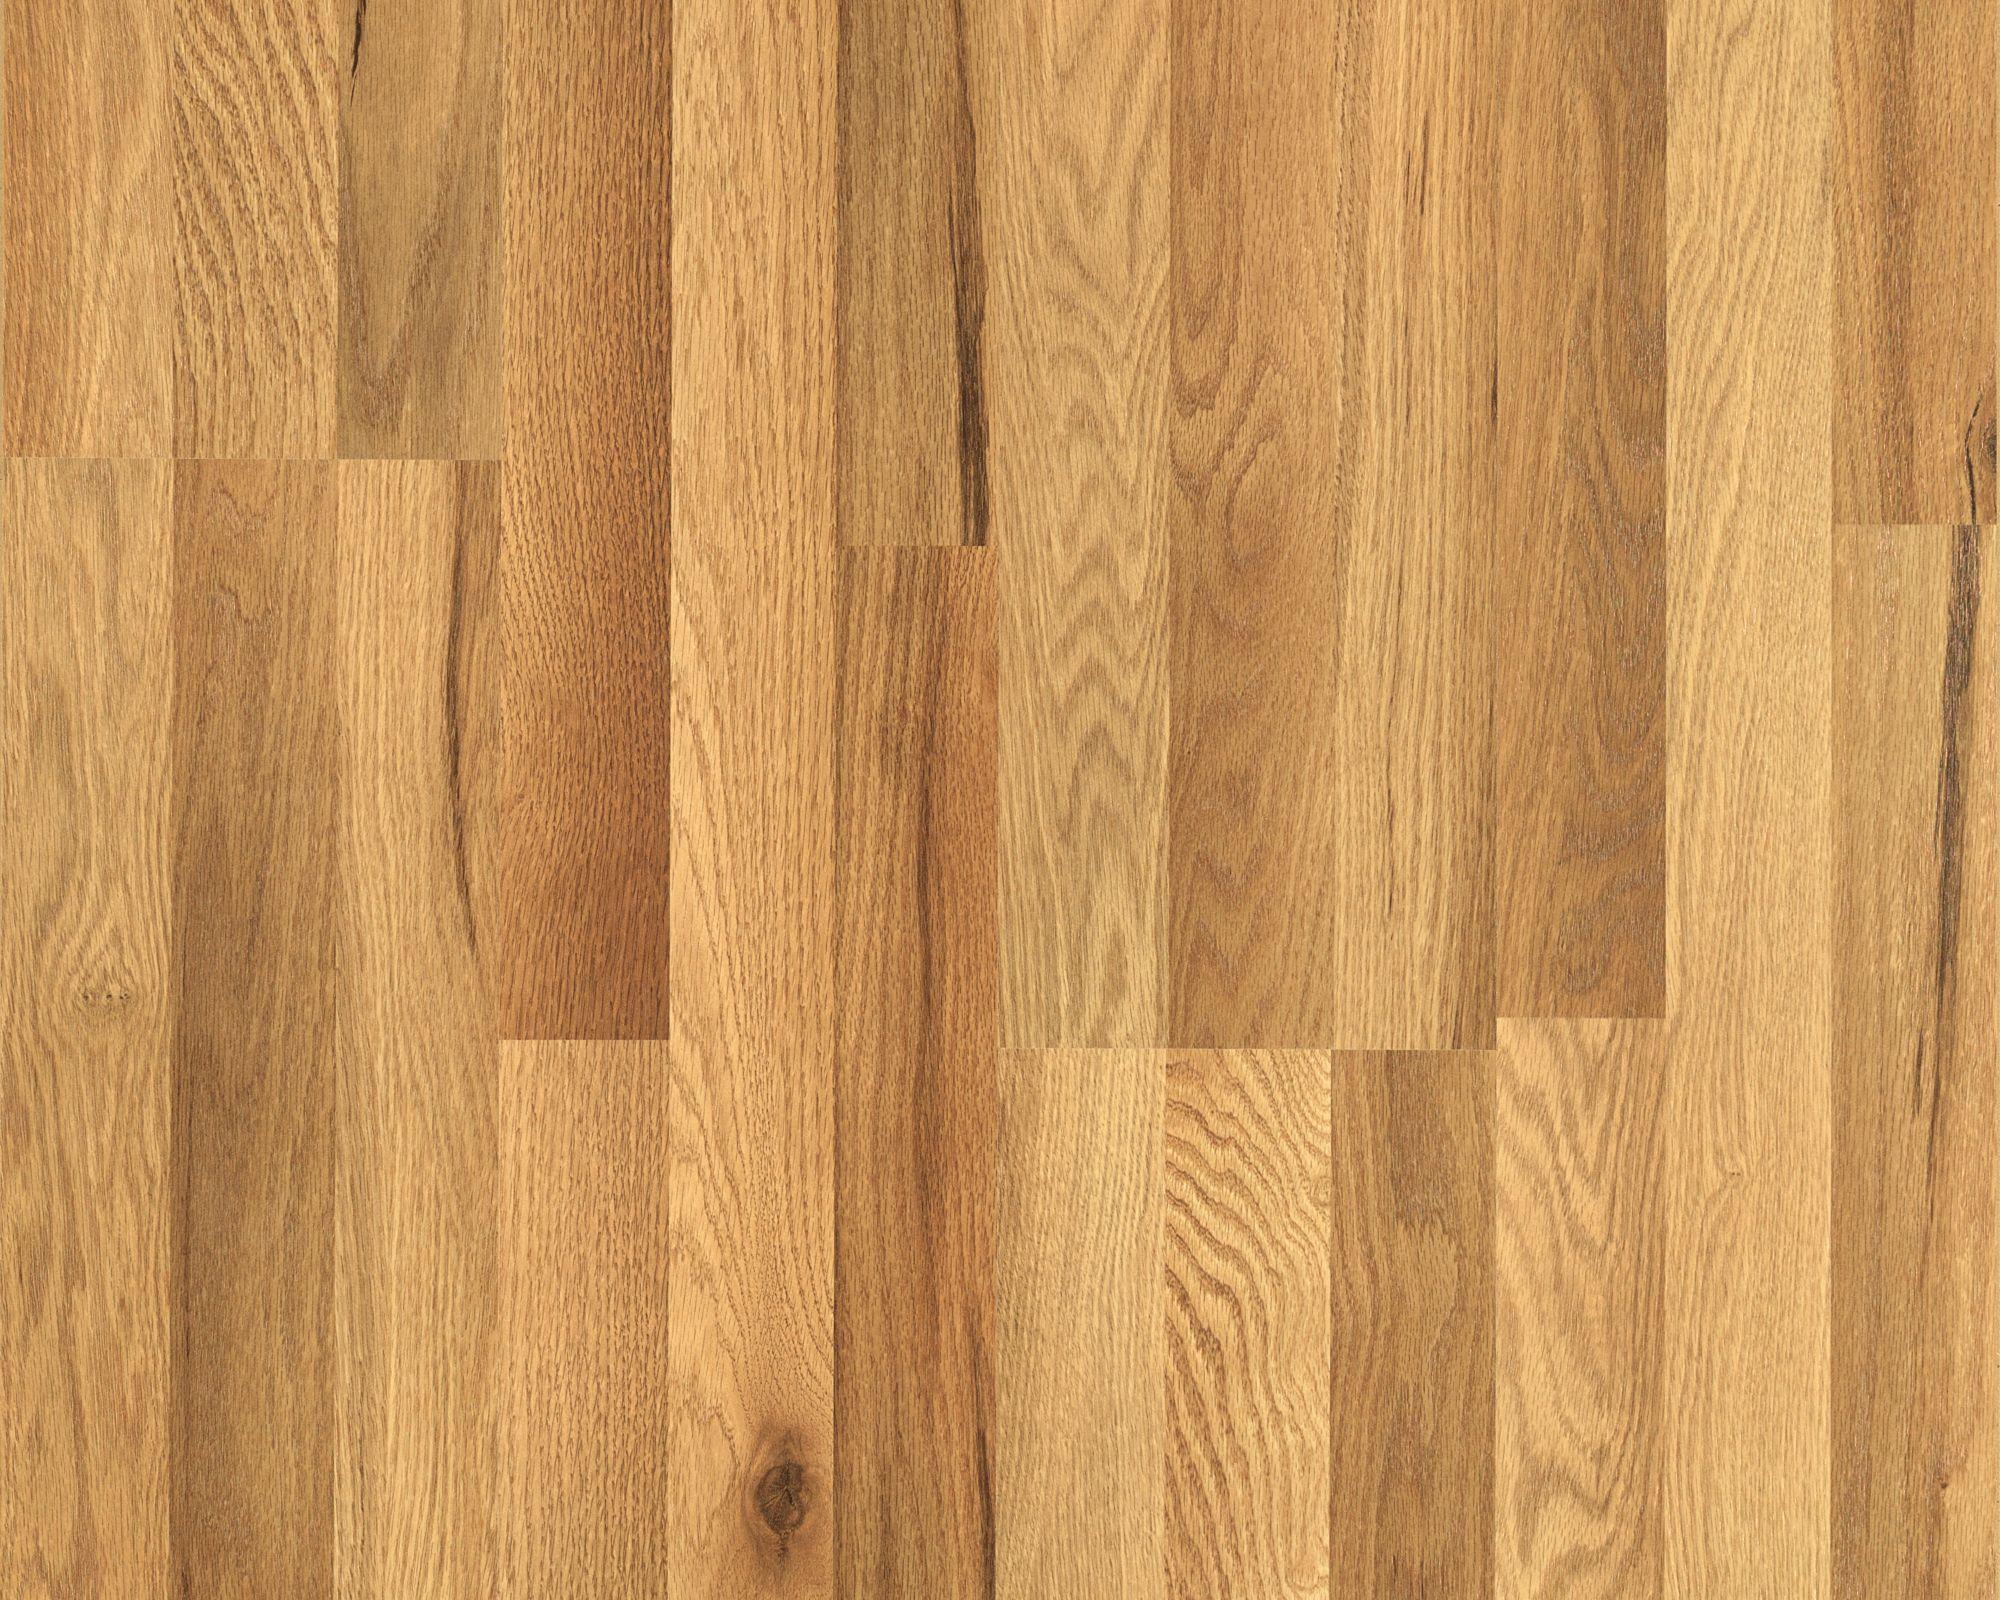 Haley Oak Pergo Xp Laminate Flooring